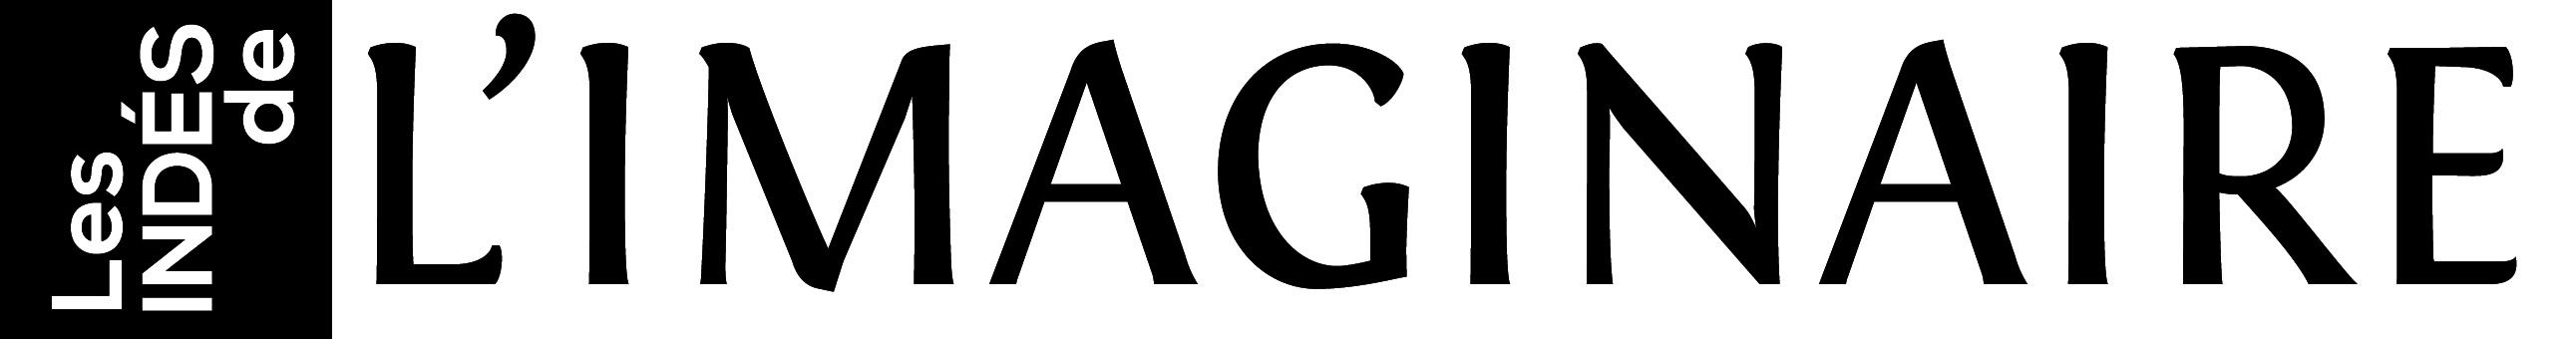 logo-indes-languette-clair